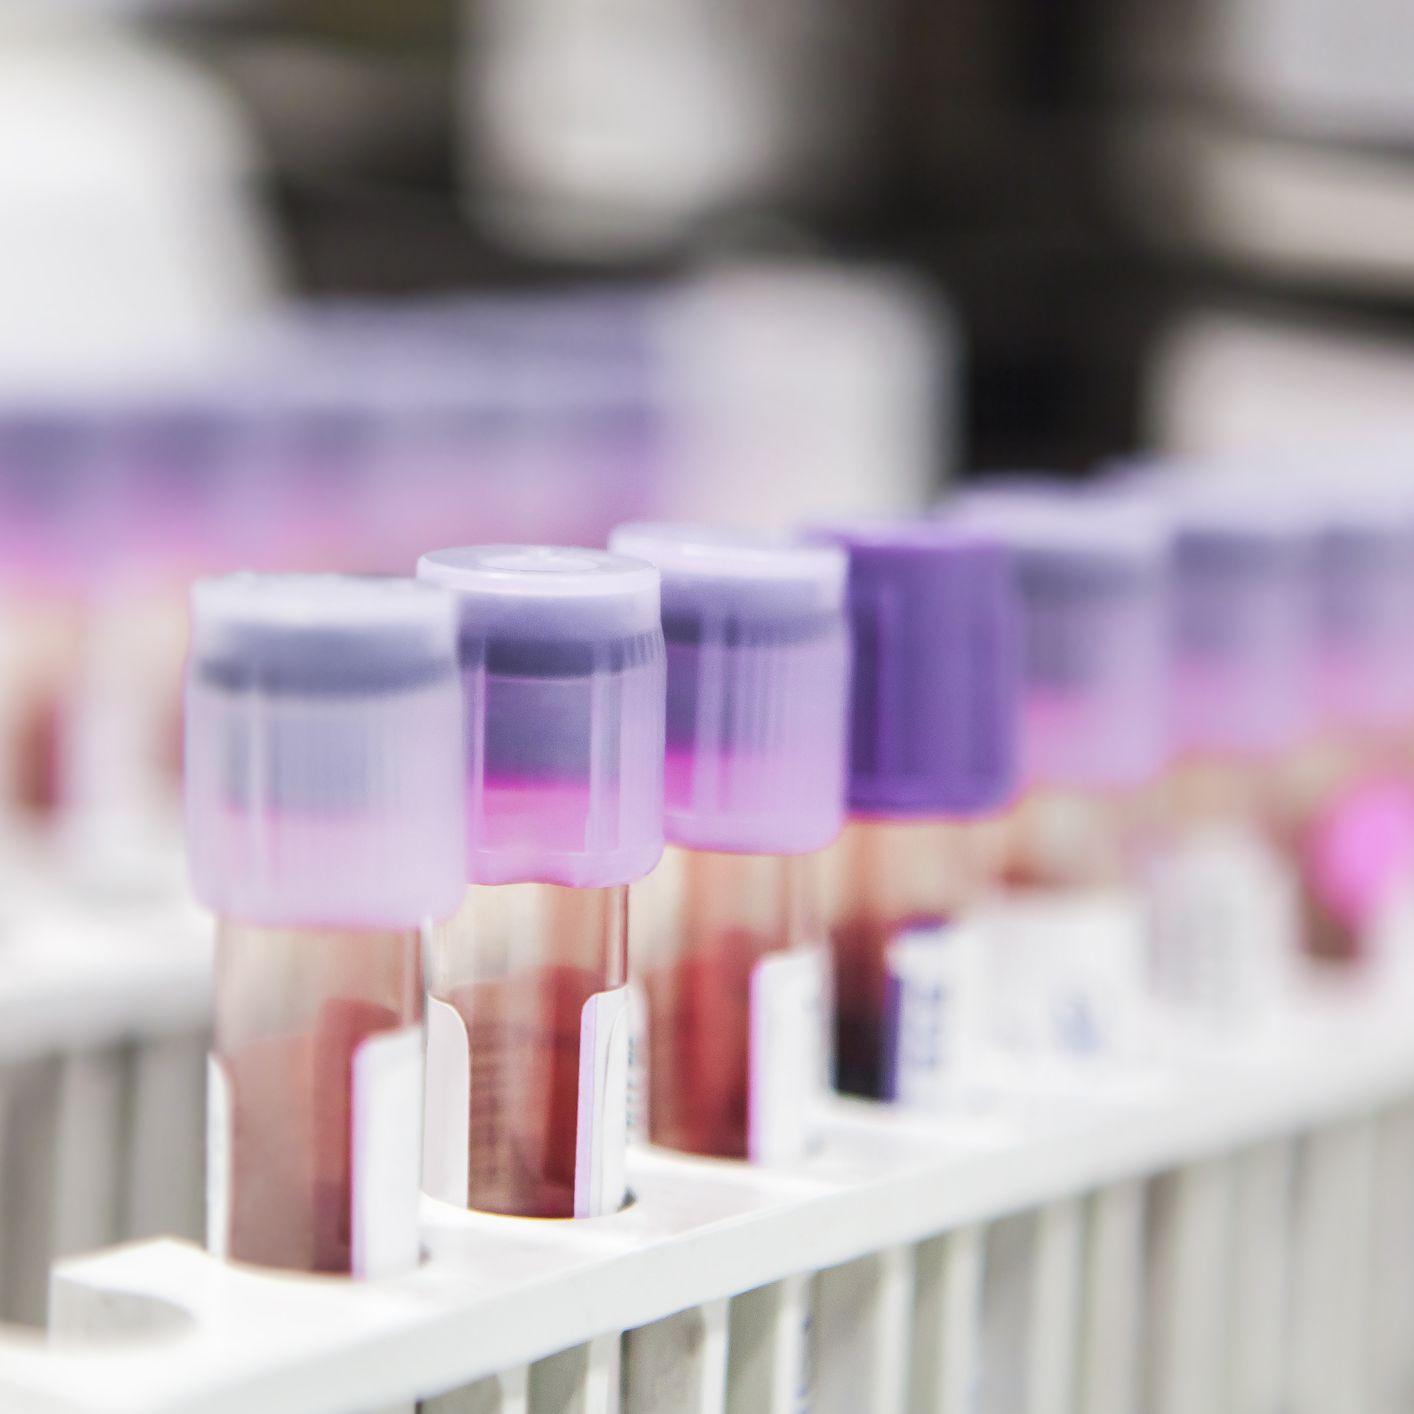 Breast Cancer Tumor-Marker Tests